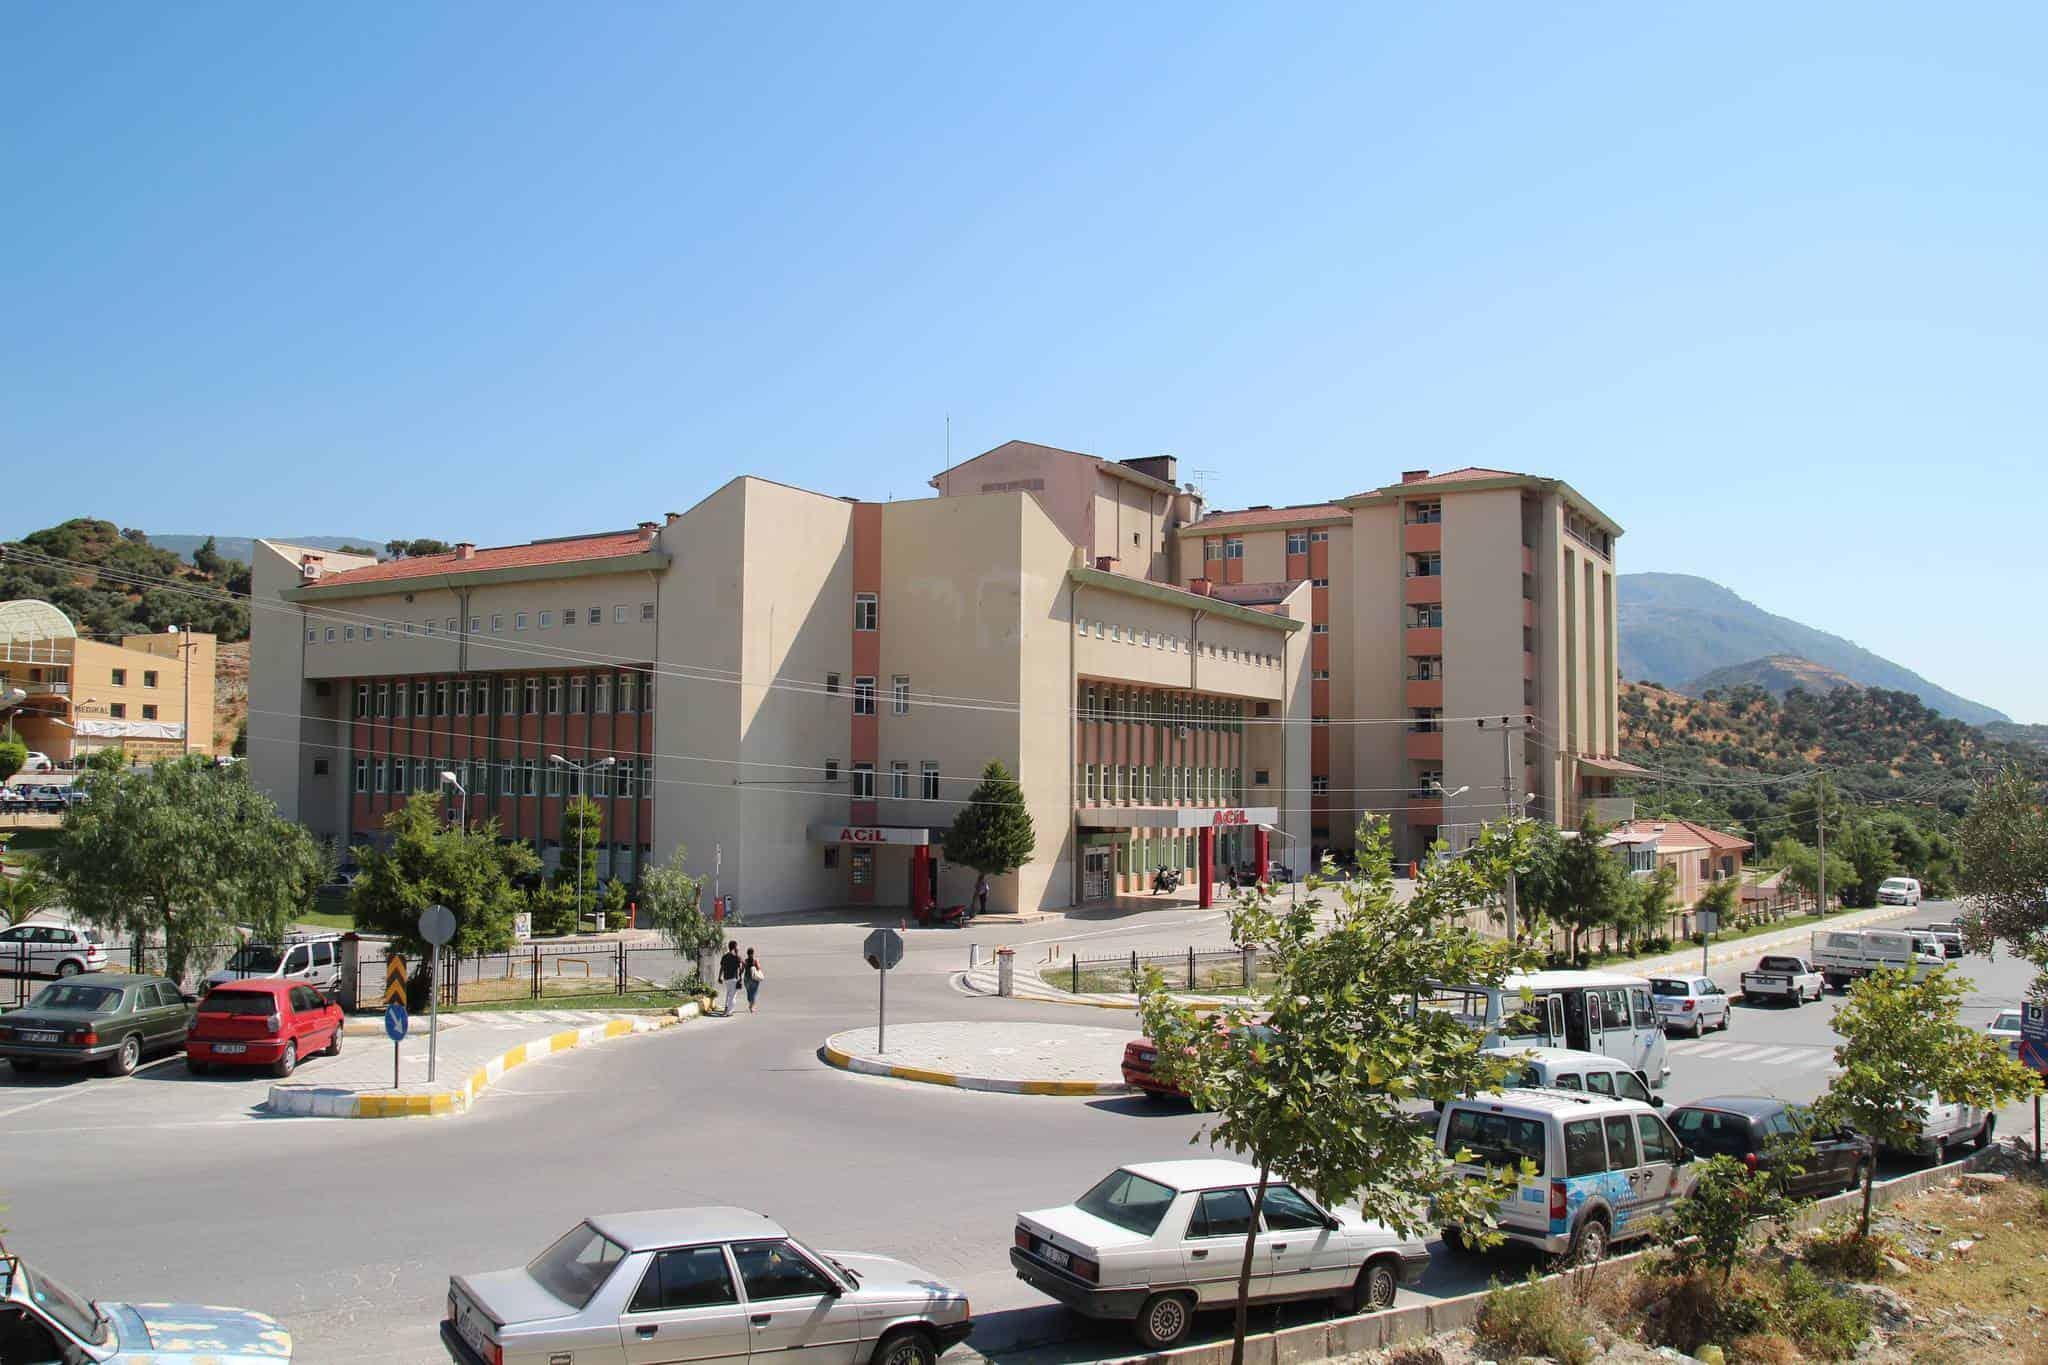 Photo of MHRS Aydın Söke Fehime Faik Kocagöz Devlet Hastanesi Randevu Alma